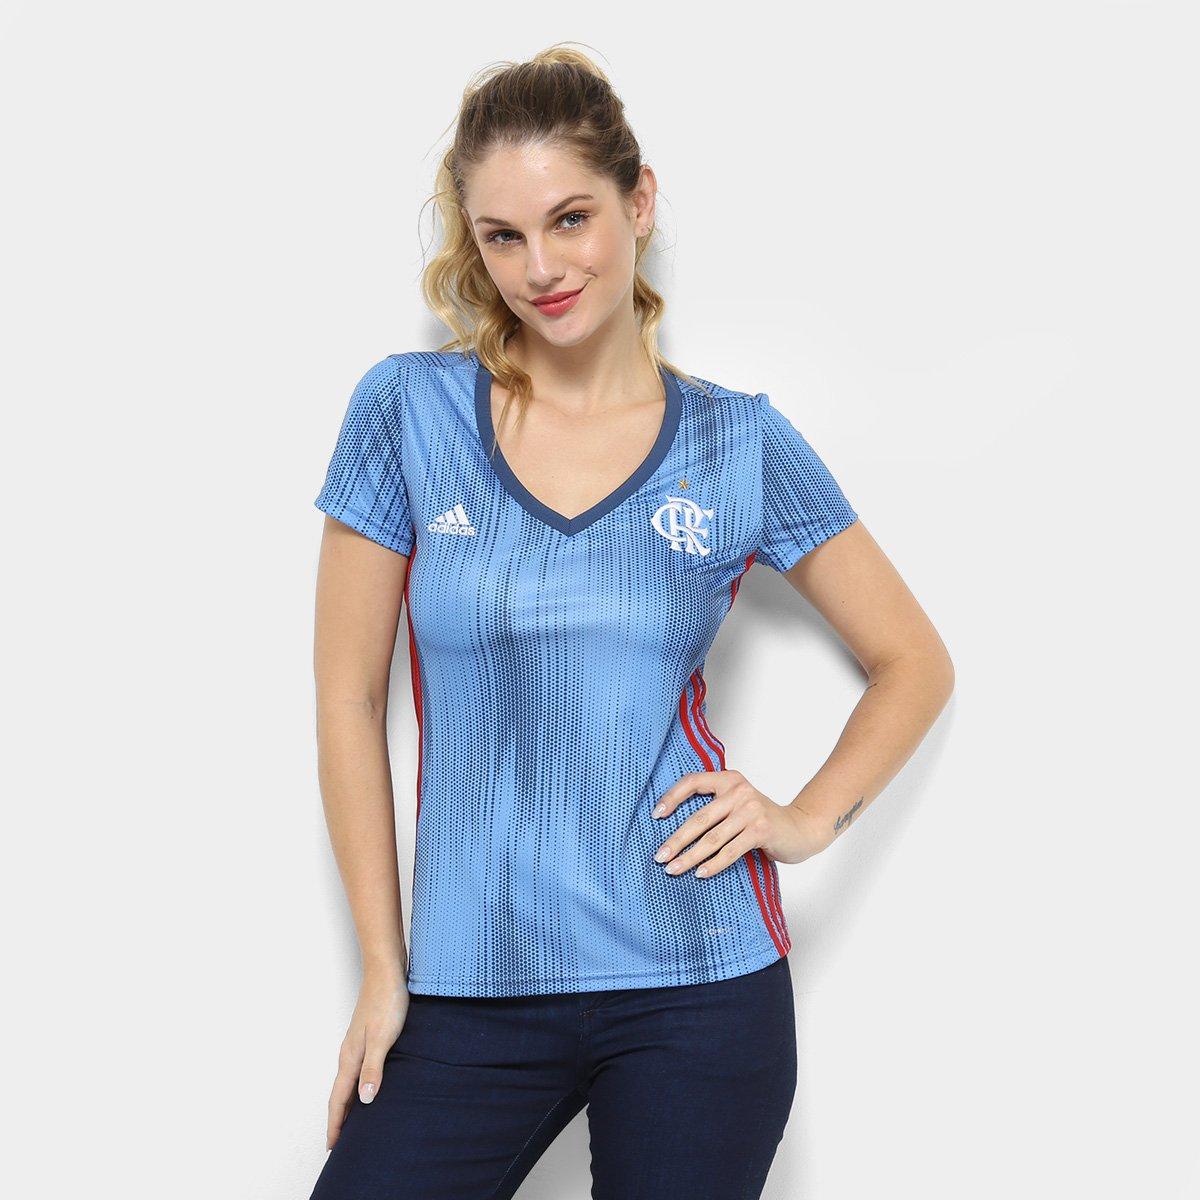 Camisa Flamengo III 2018 s n° - Torcedor Adidas Feminina - Azul - Compre  Agora  0b81d62269b